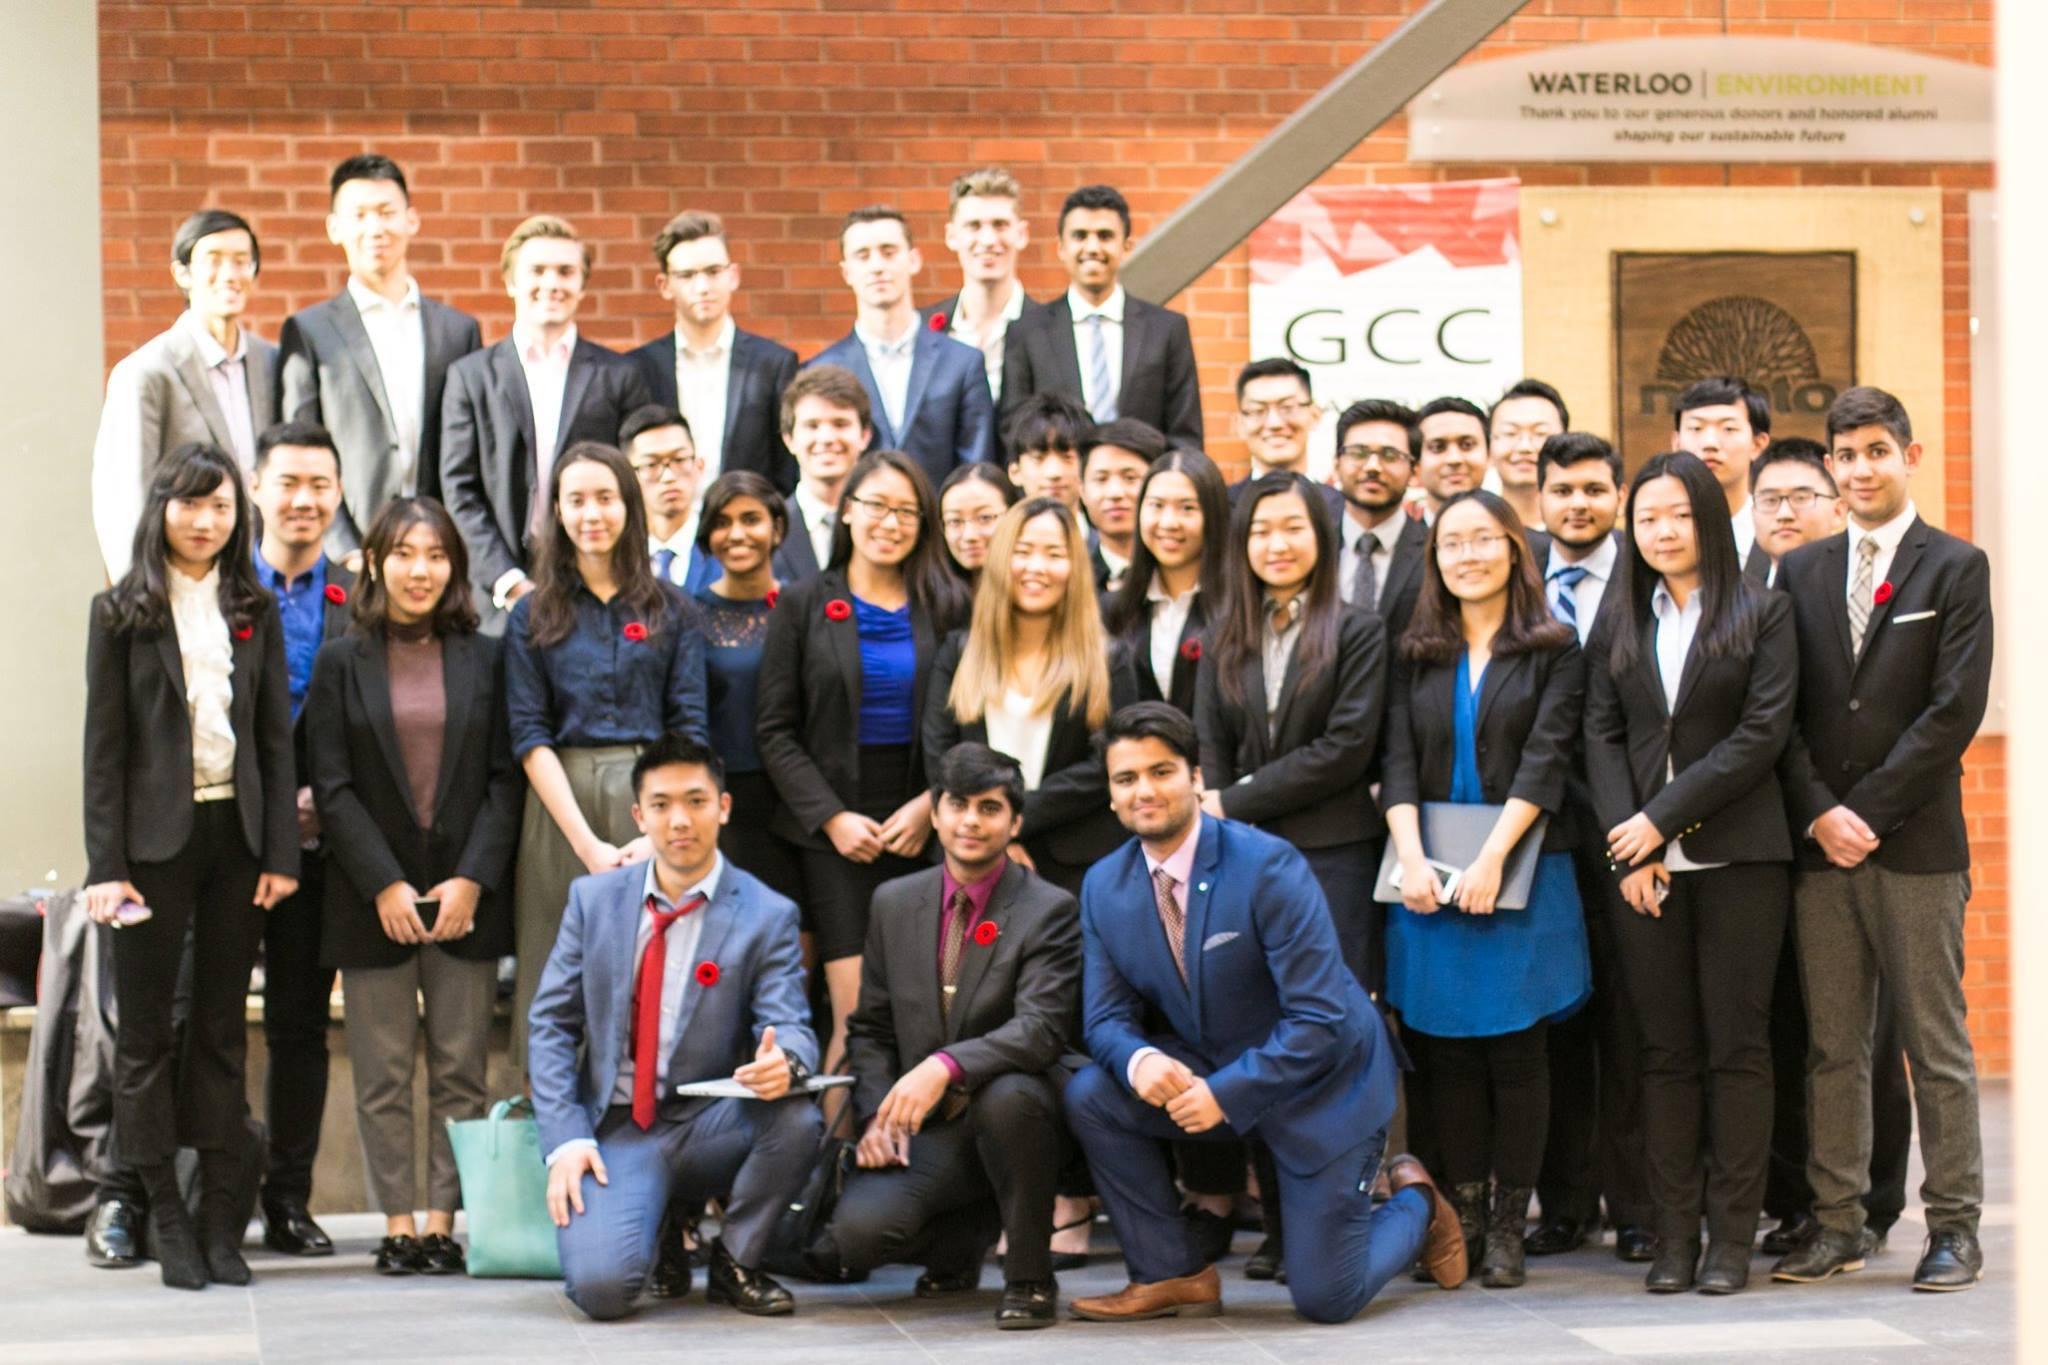 GCC McGill University